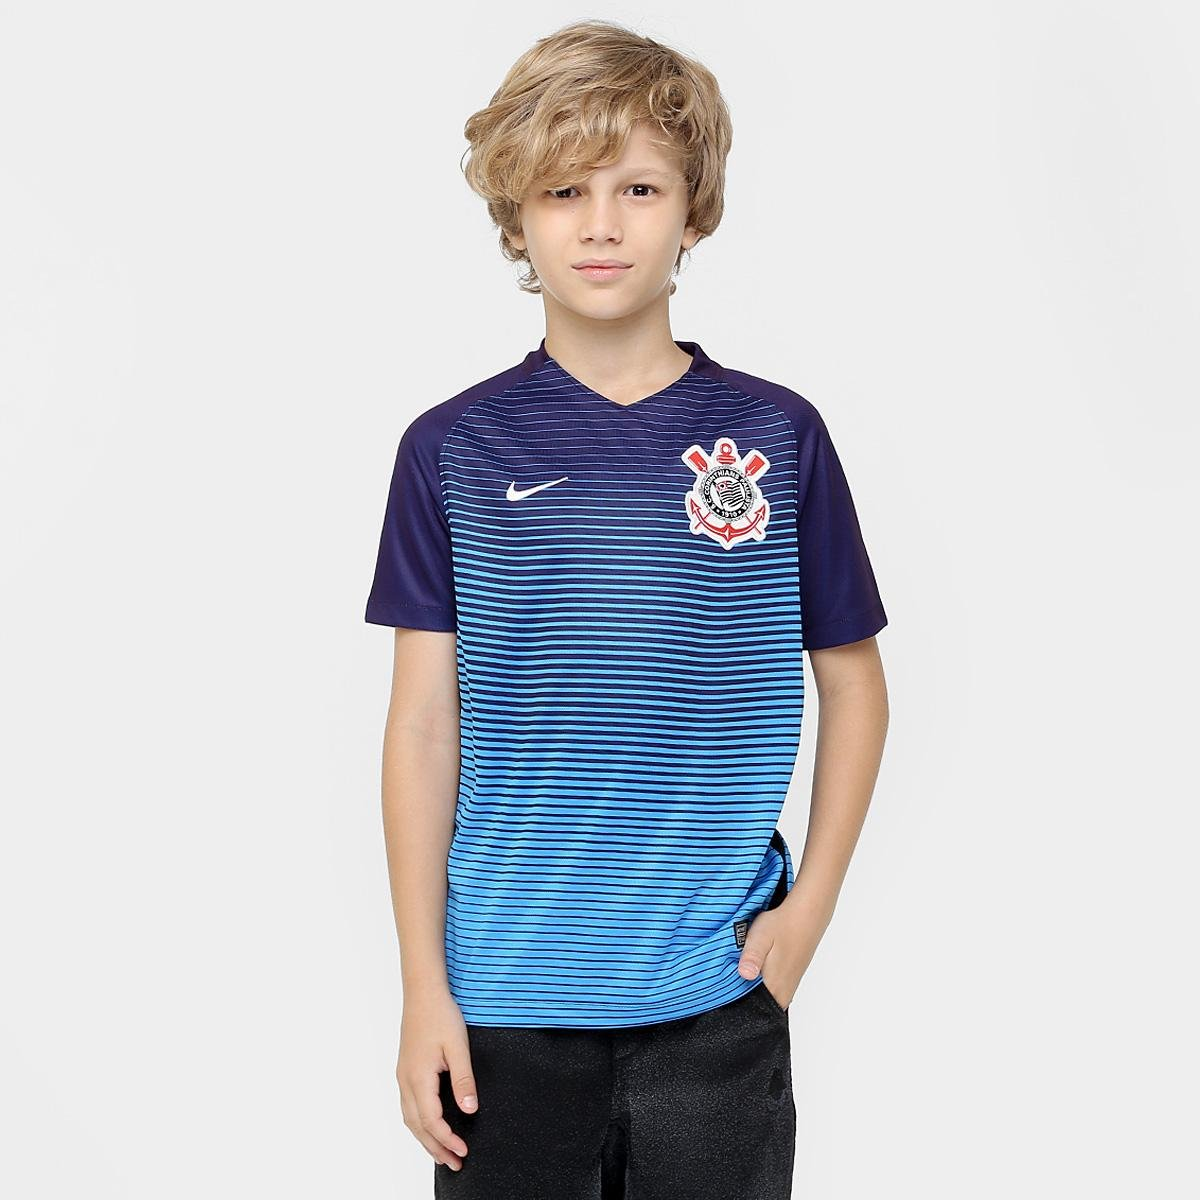 457eaffd12cc0 Camisa Corinthians Juvenil III 2016 s nº Torcedor Nike - Compre Agora